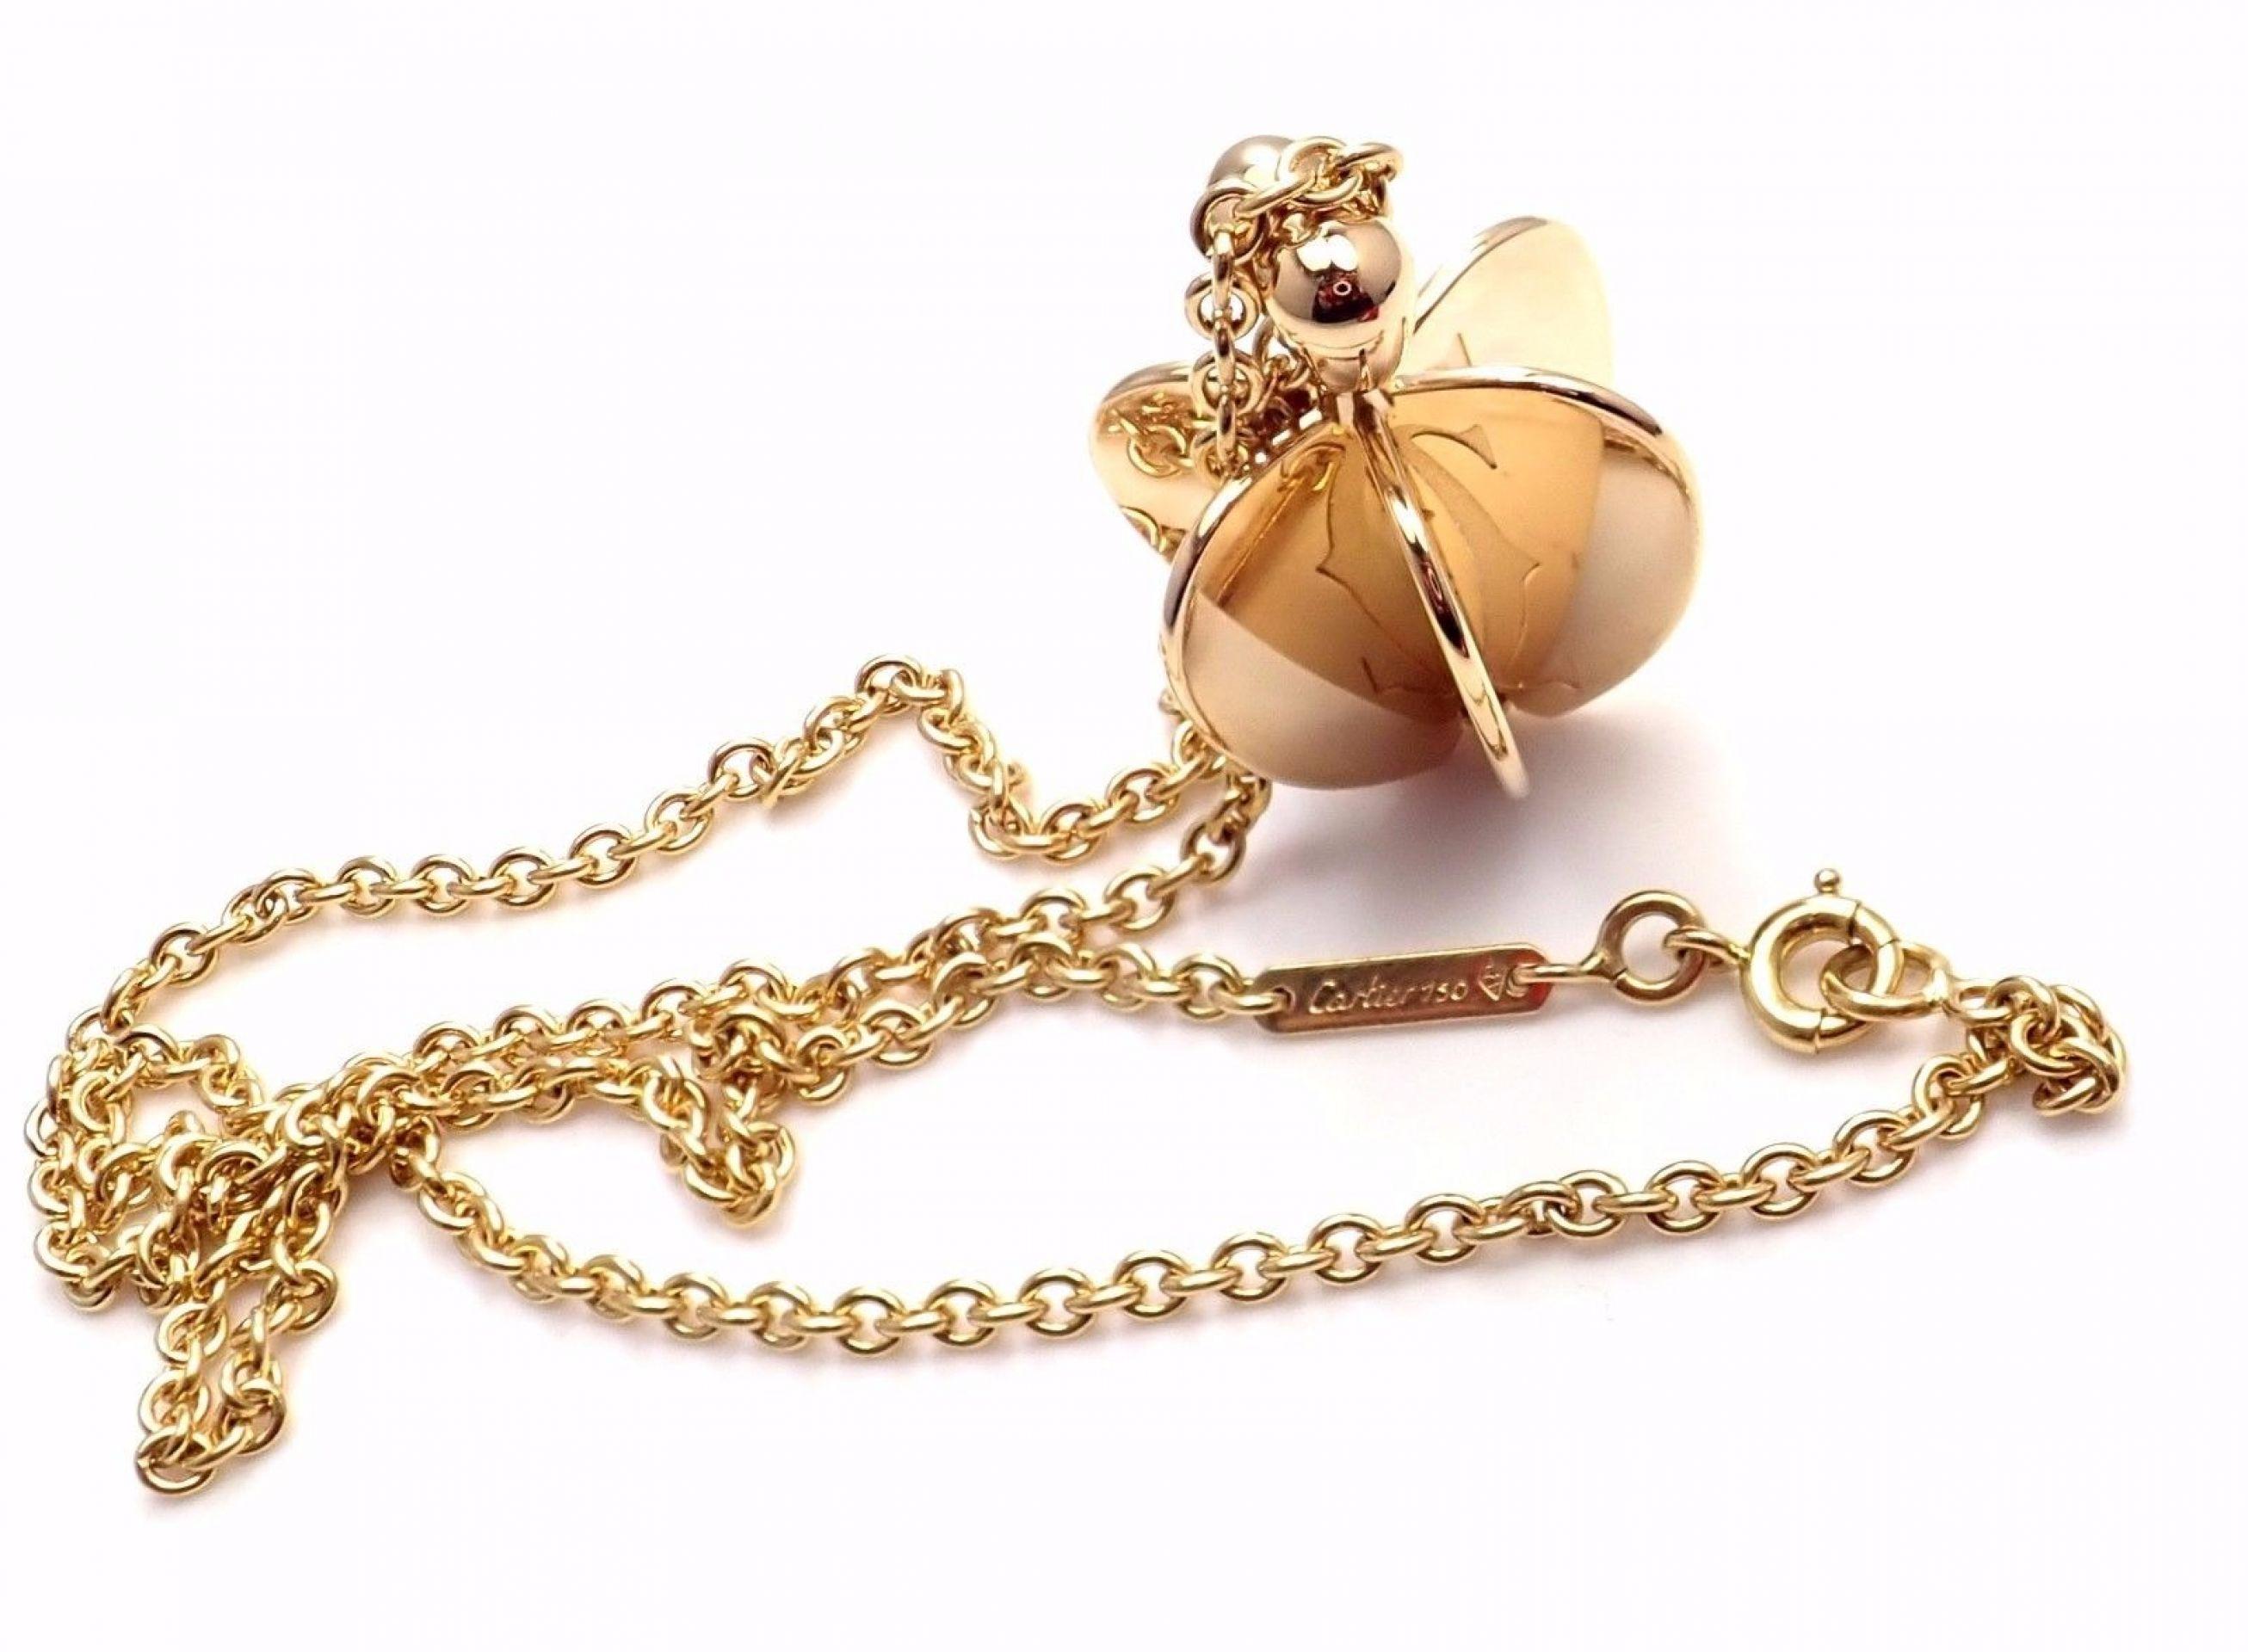 Authentic! Cartier 18k Yellow Gold Double C Apple Heart Pendant Chain Necklace